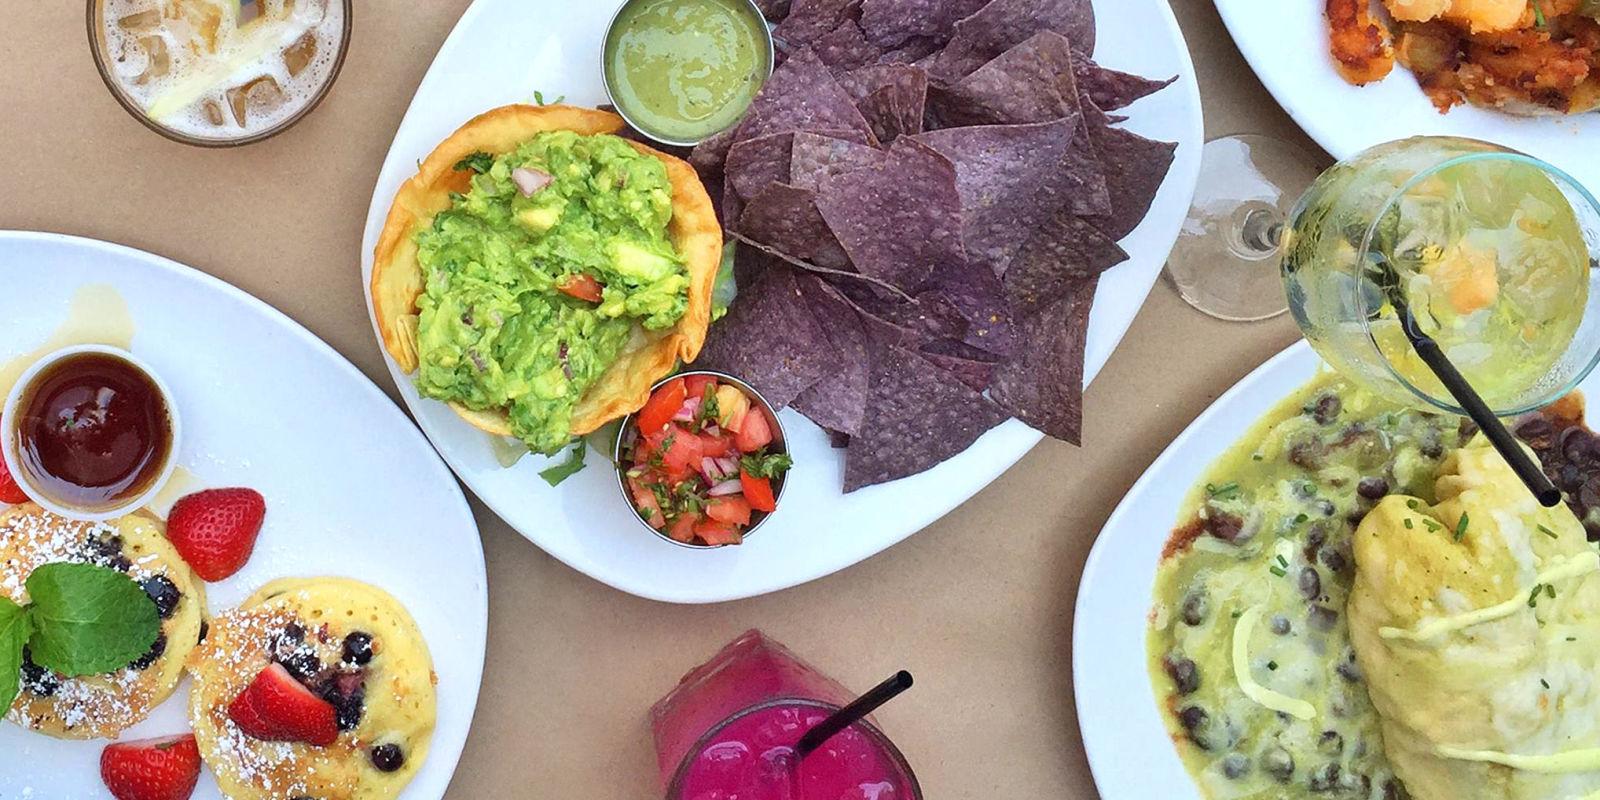 8 Best Bottomless Brunch Restaurants In NYC Where To Get Bottomless Brunch